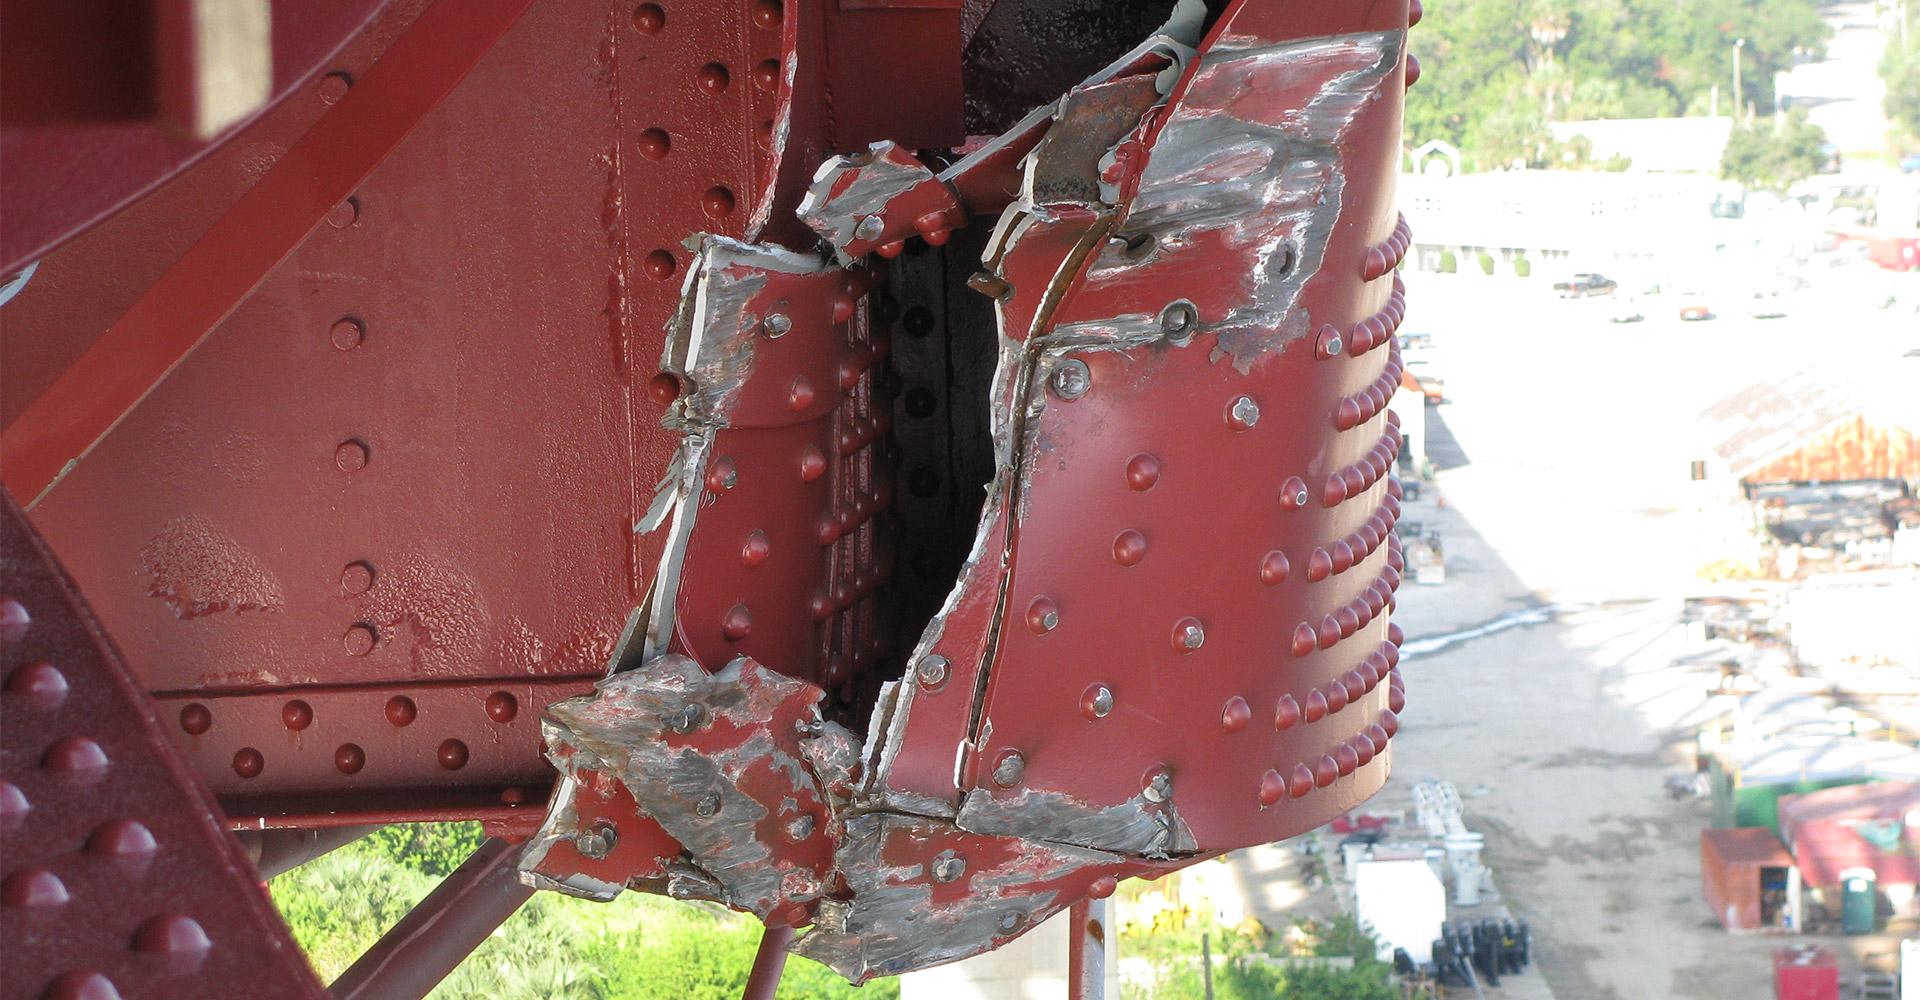 Up close view of damage to Mathews Bridge.